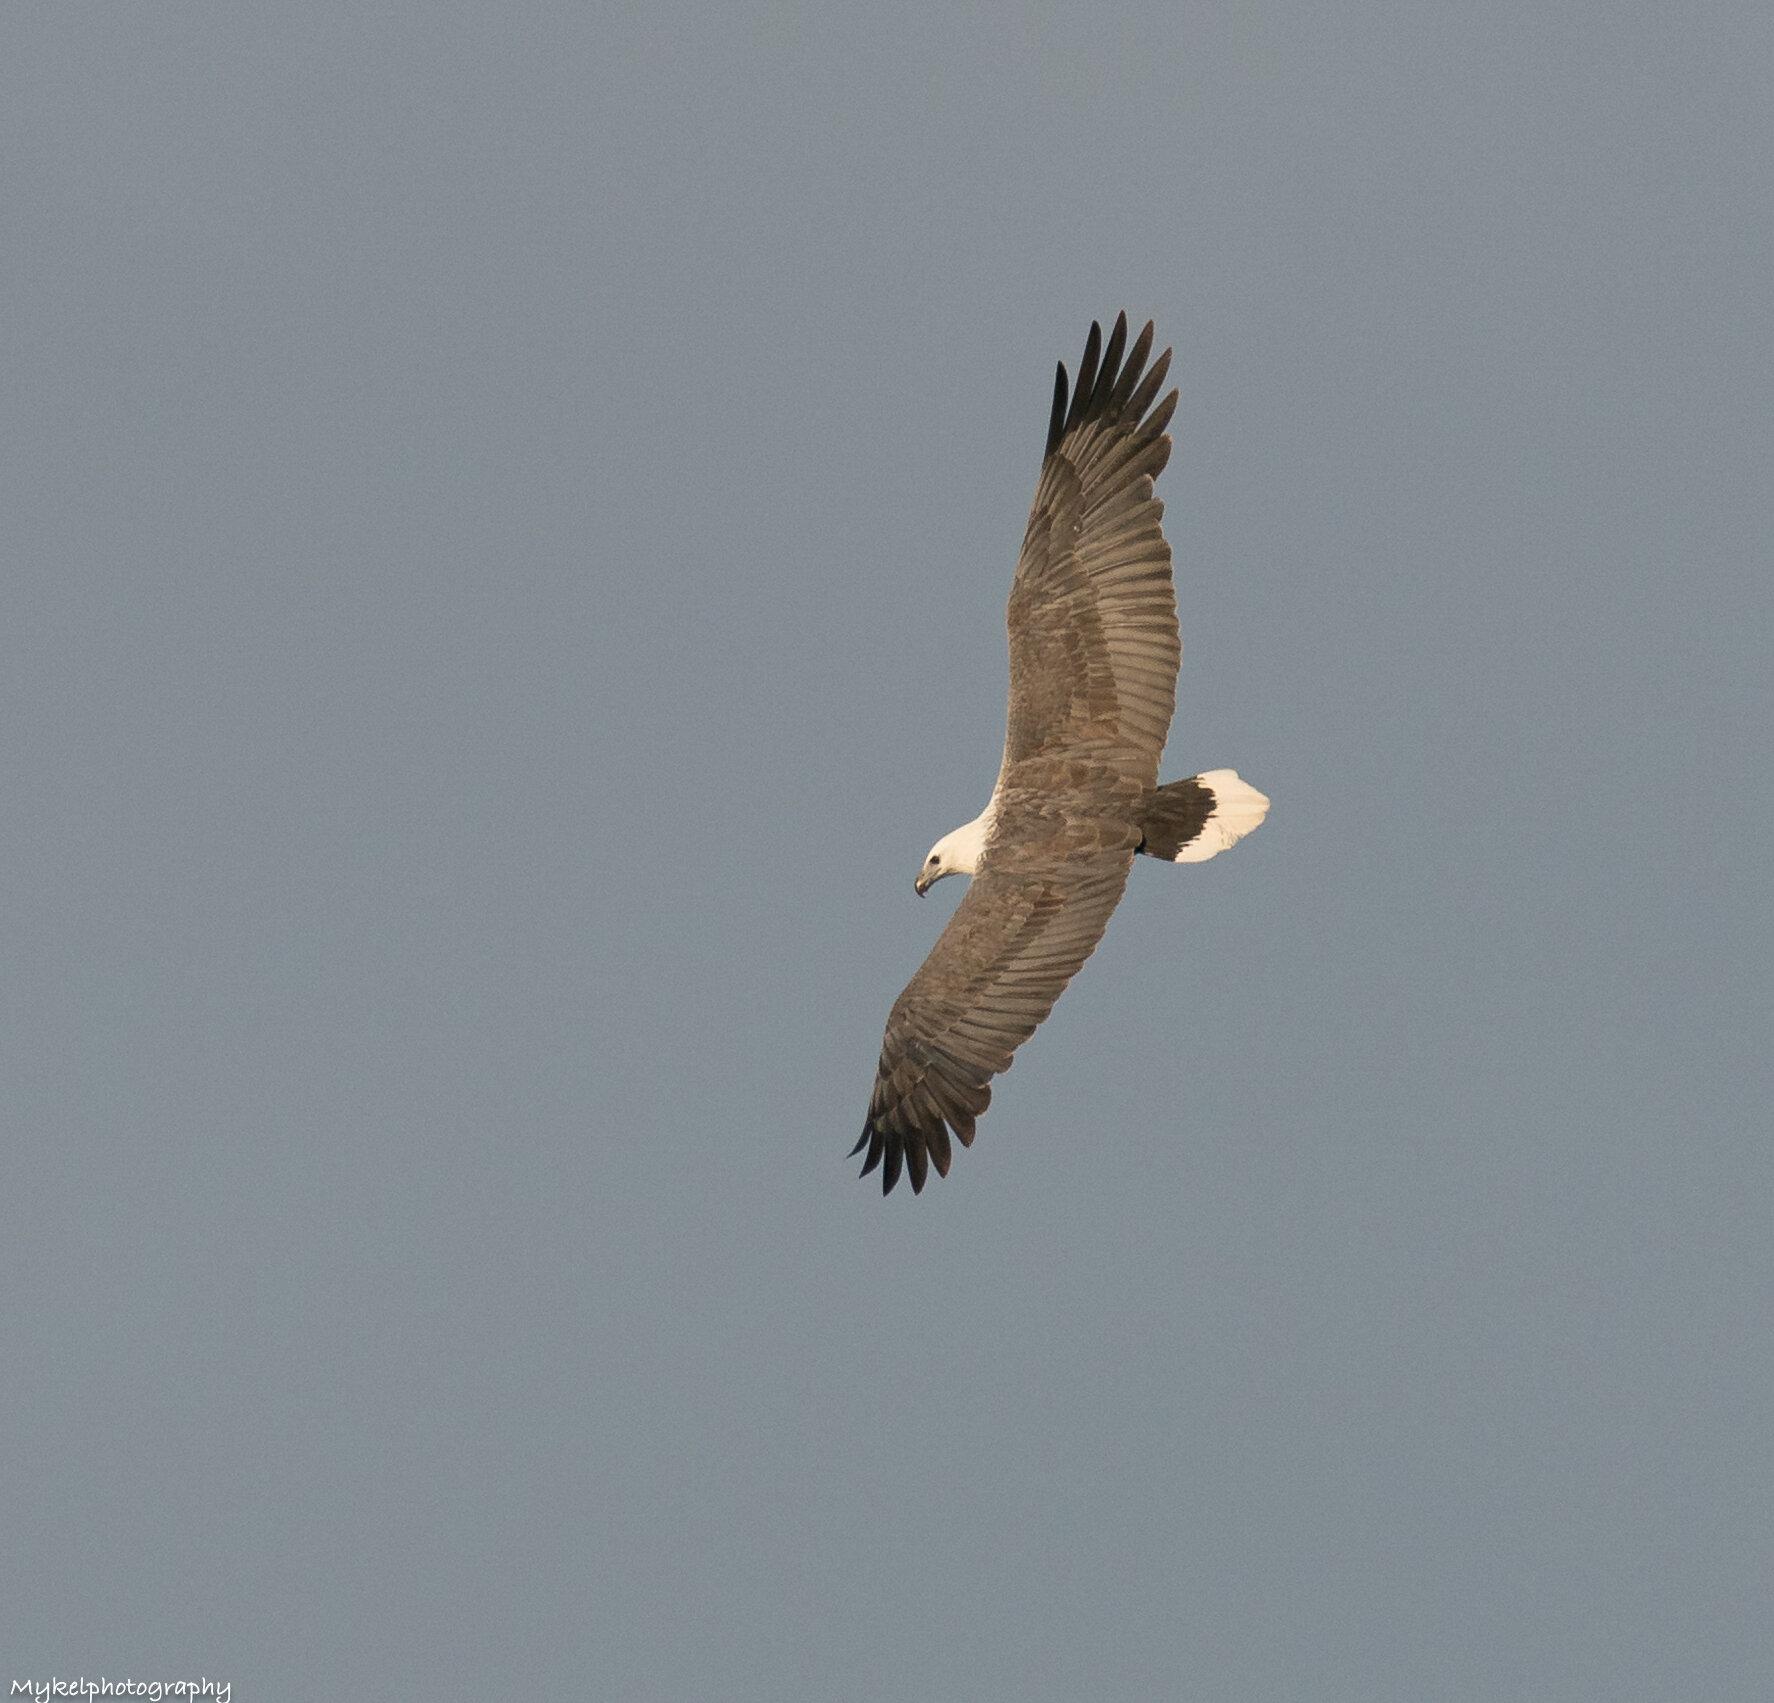 White-bellied Sea-Eagle   Haliaeetus leucogaster  Accipitridae